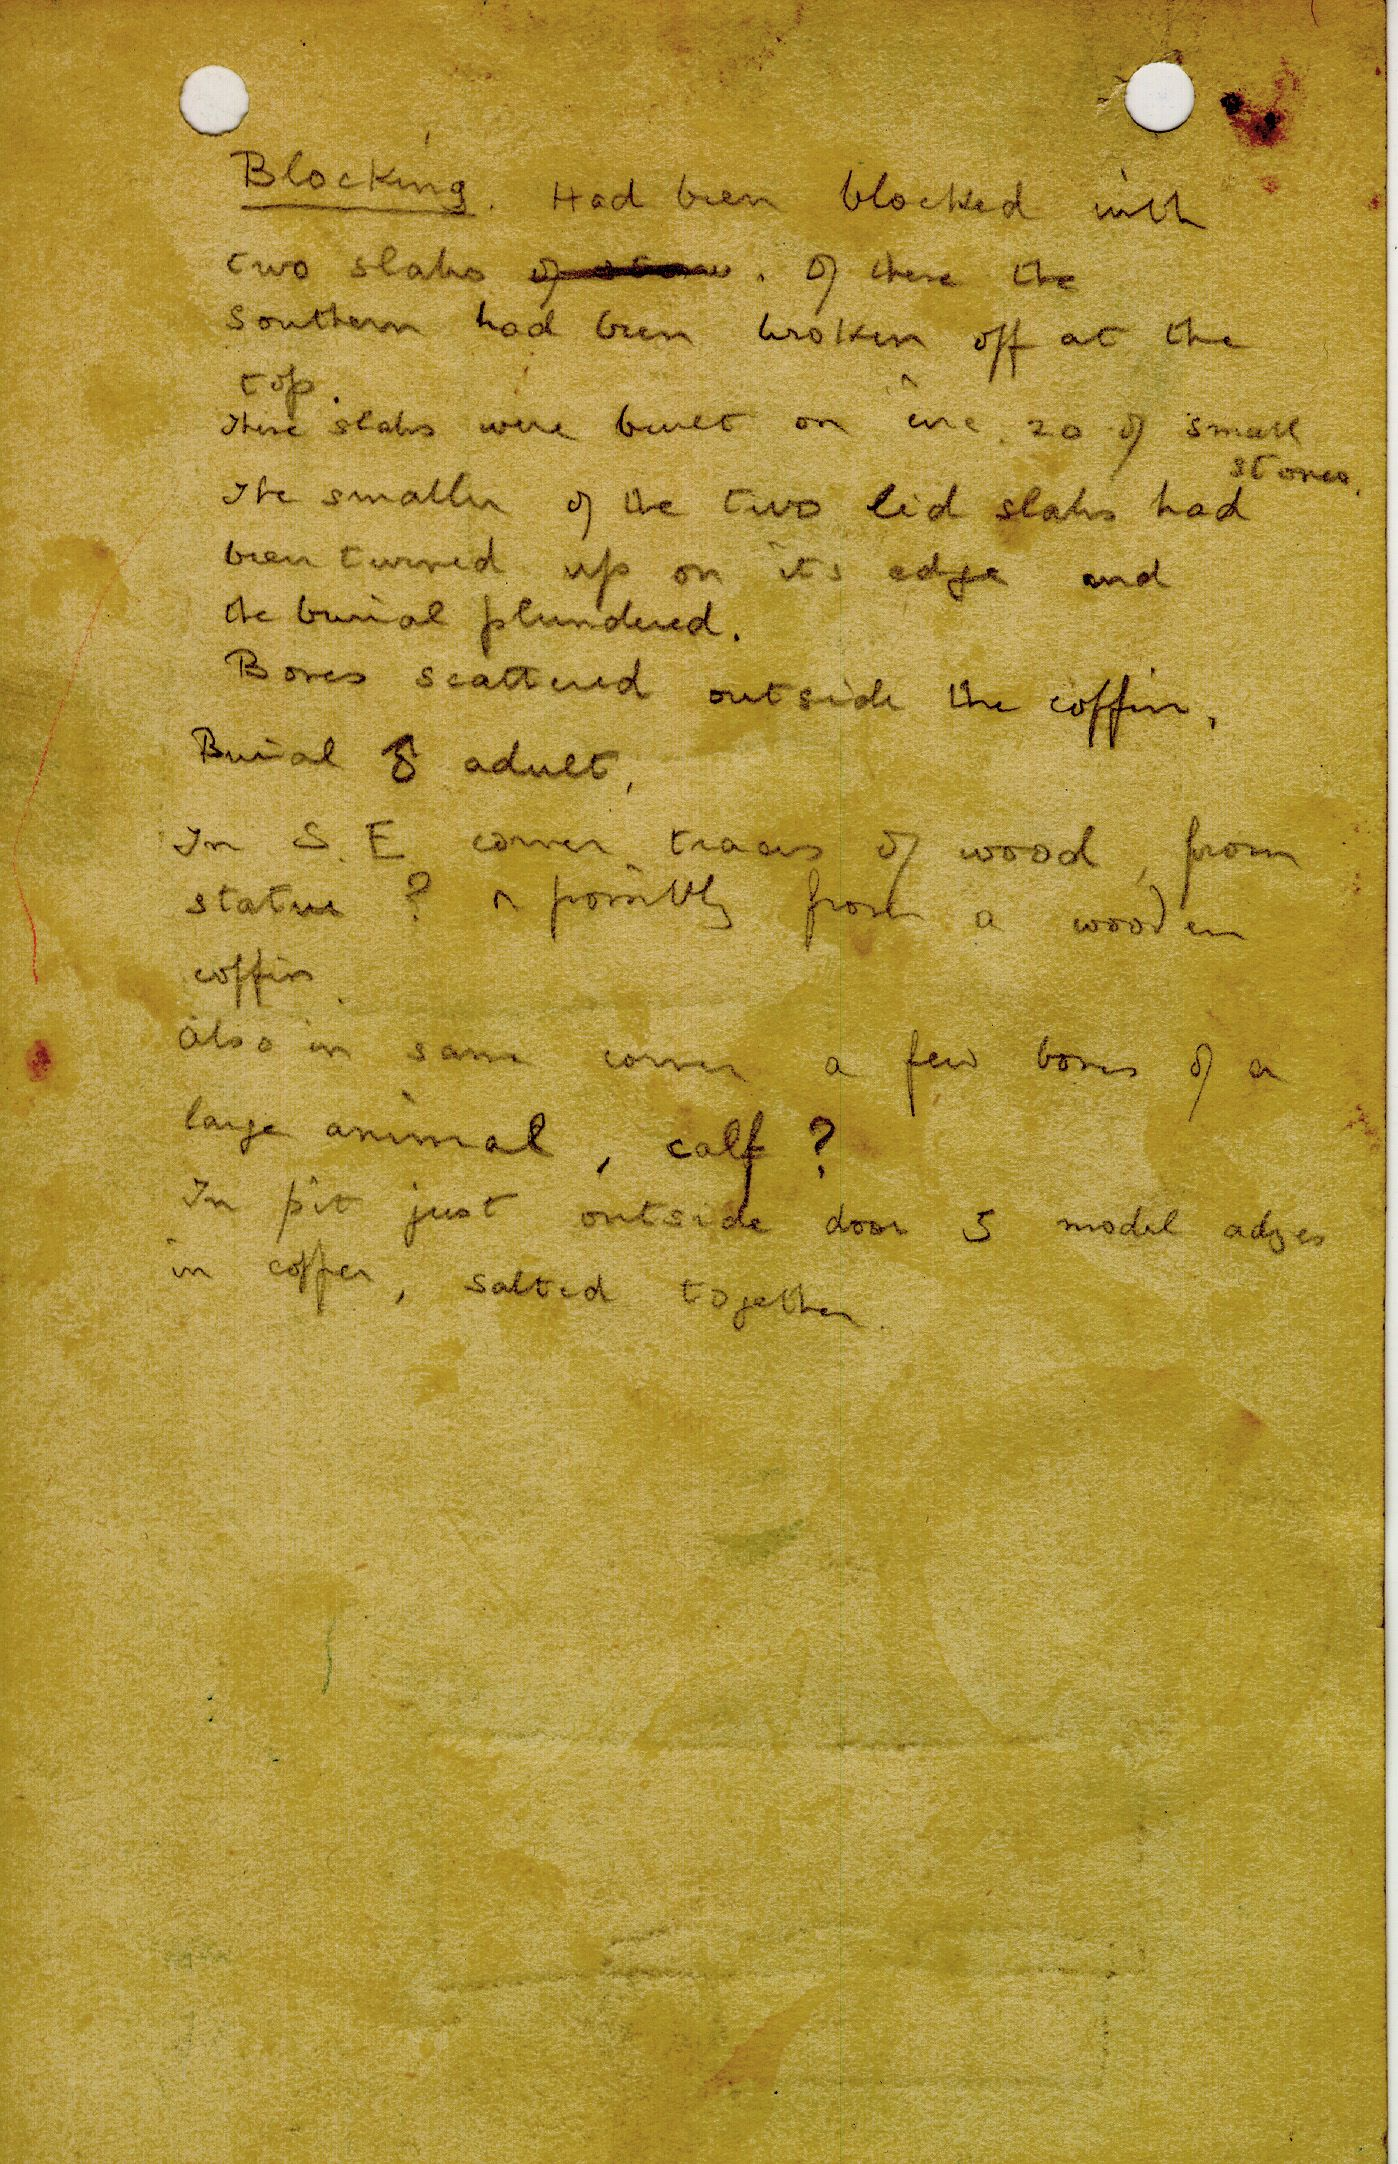 Notes: G 1208, Shaft F (I), notes